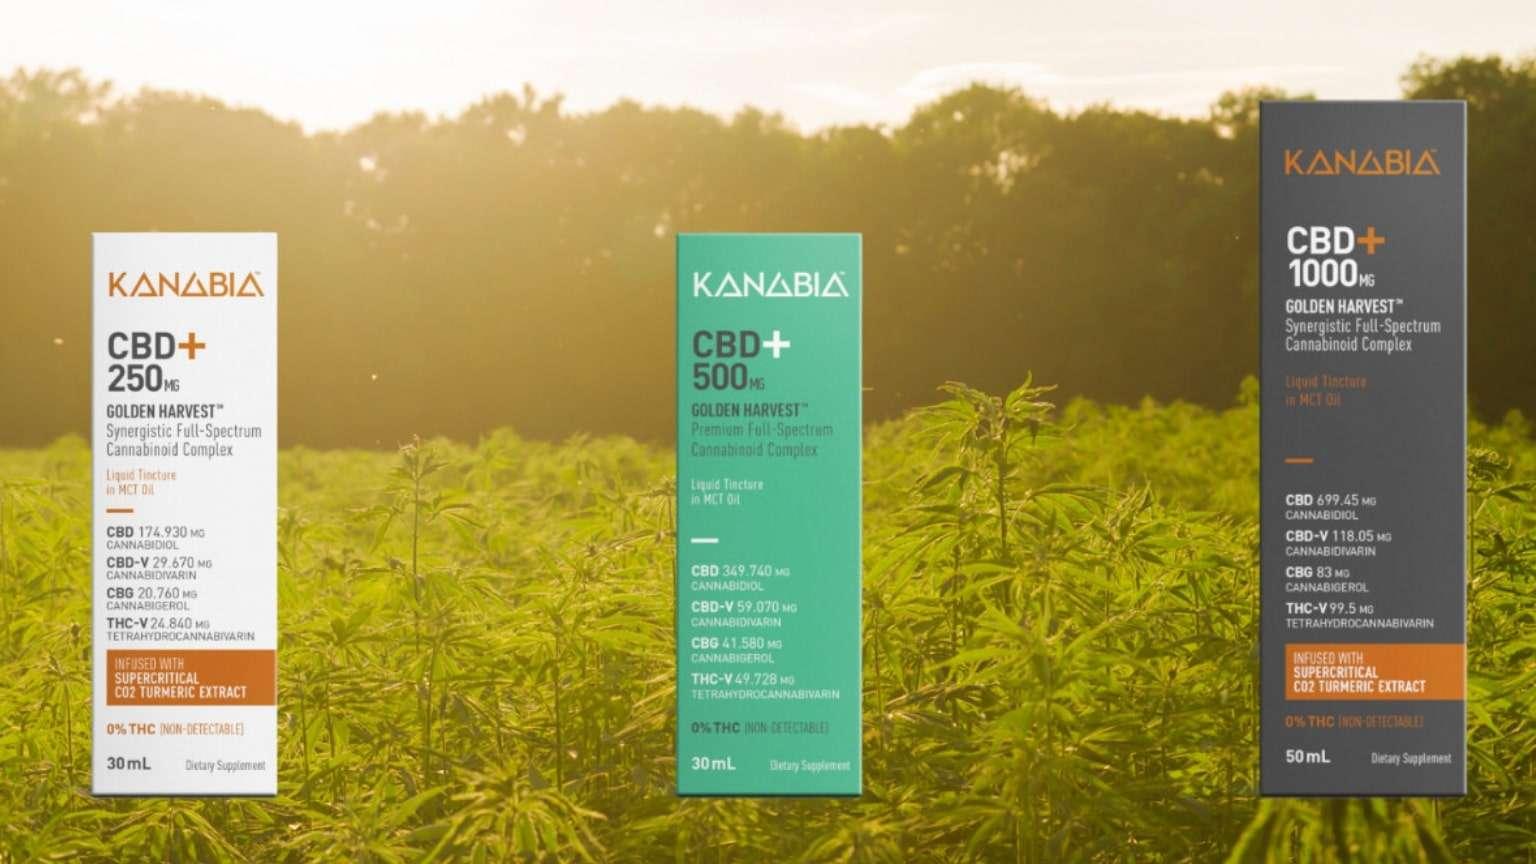 kanabia-cbd-oil